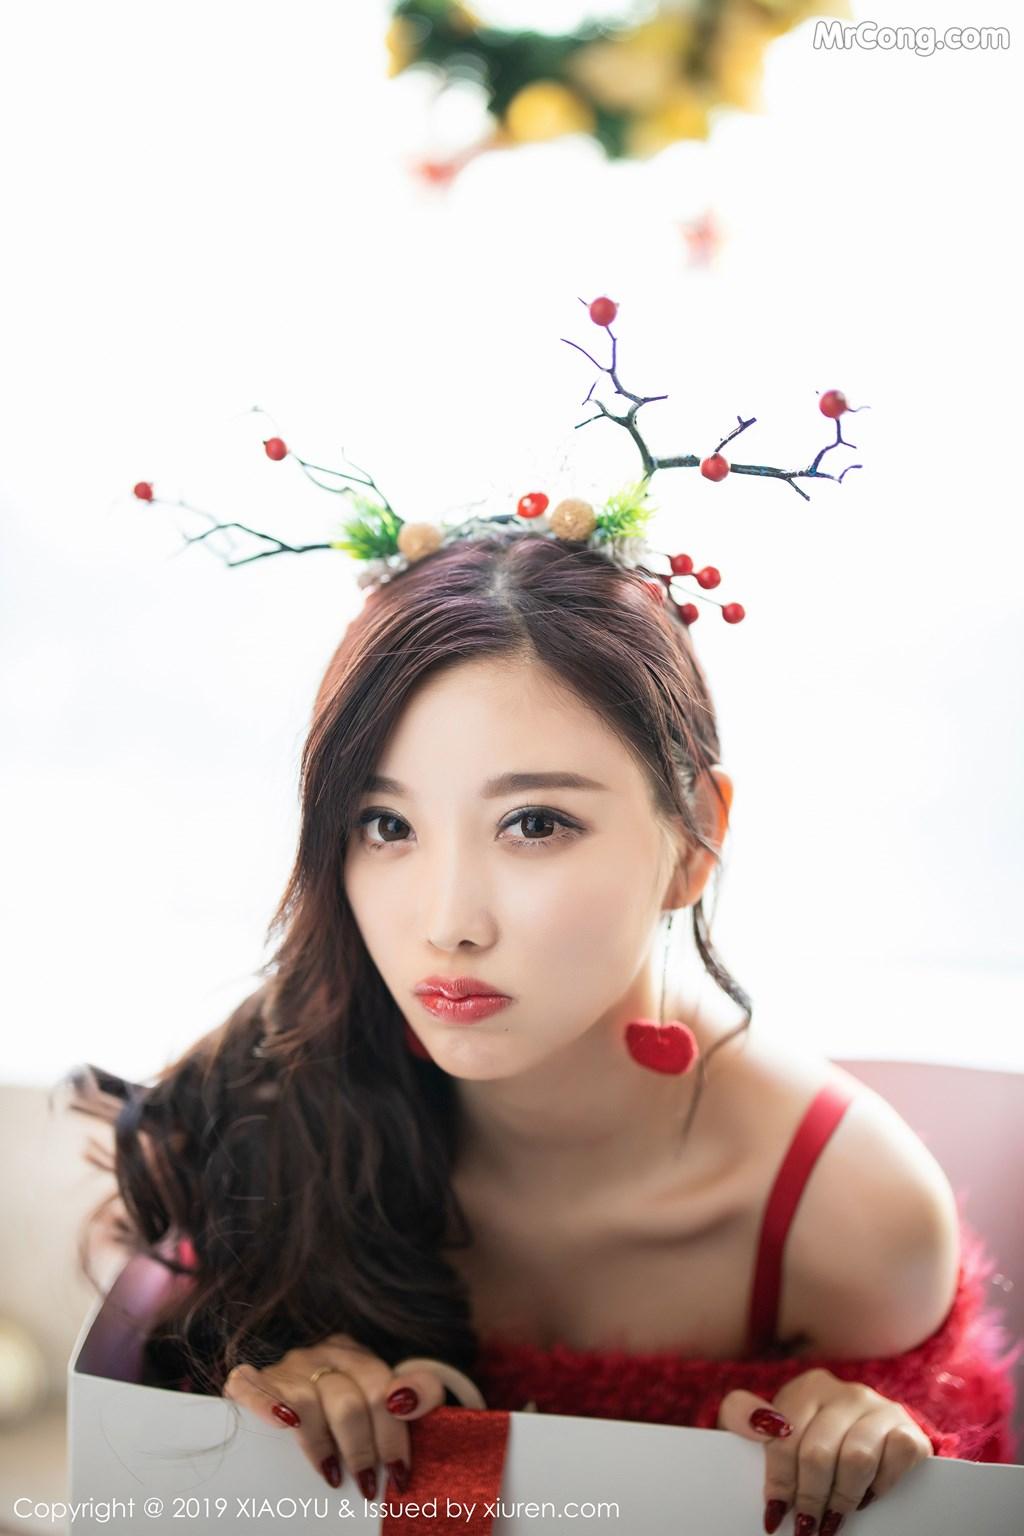 XiaoYu Vol.221: Yang Chen Chen (杨晨晨sugar) (72P)